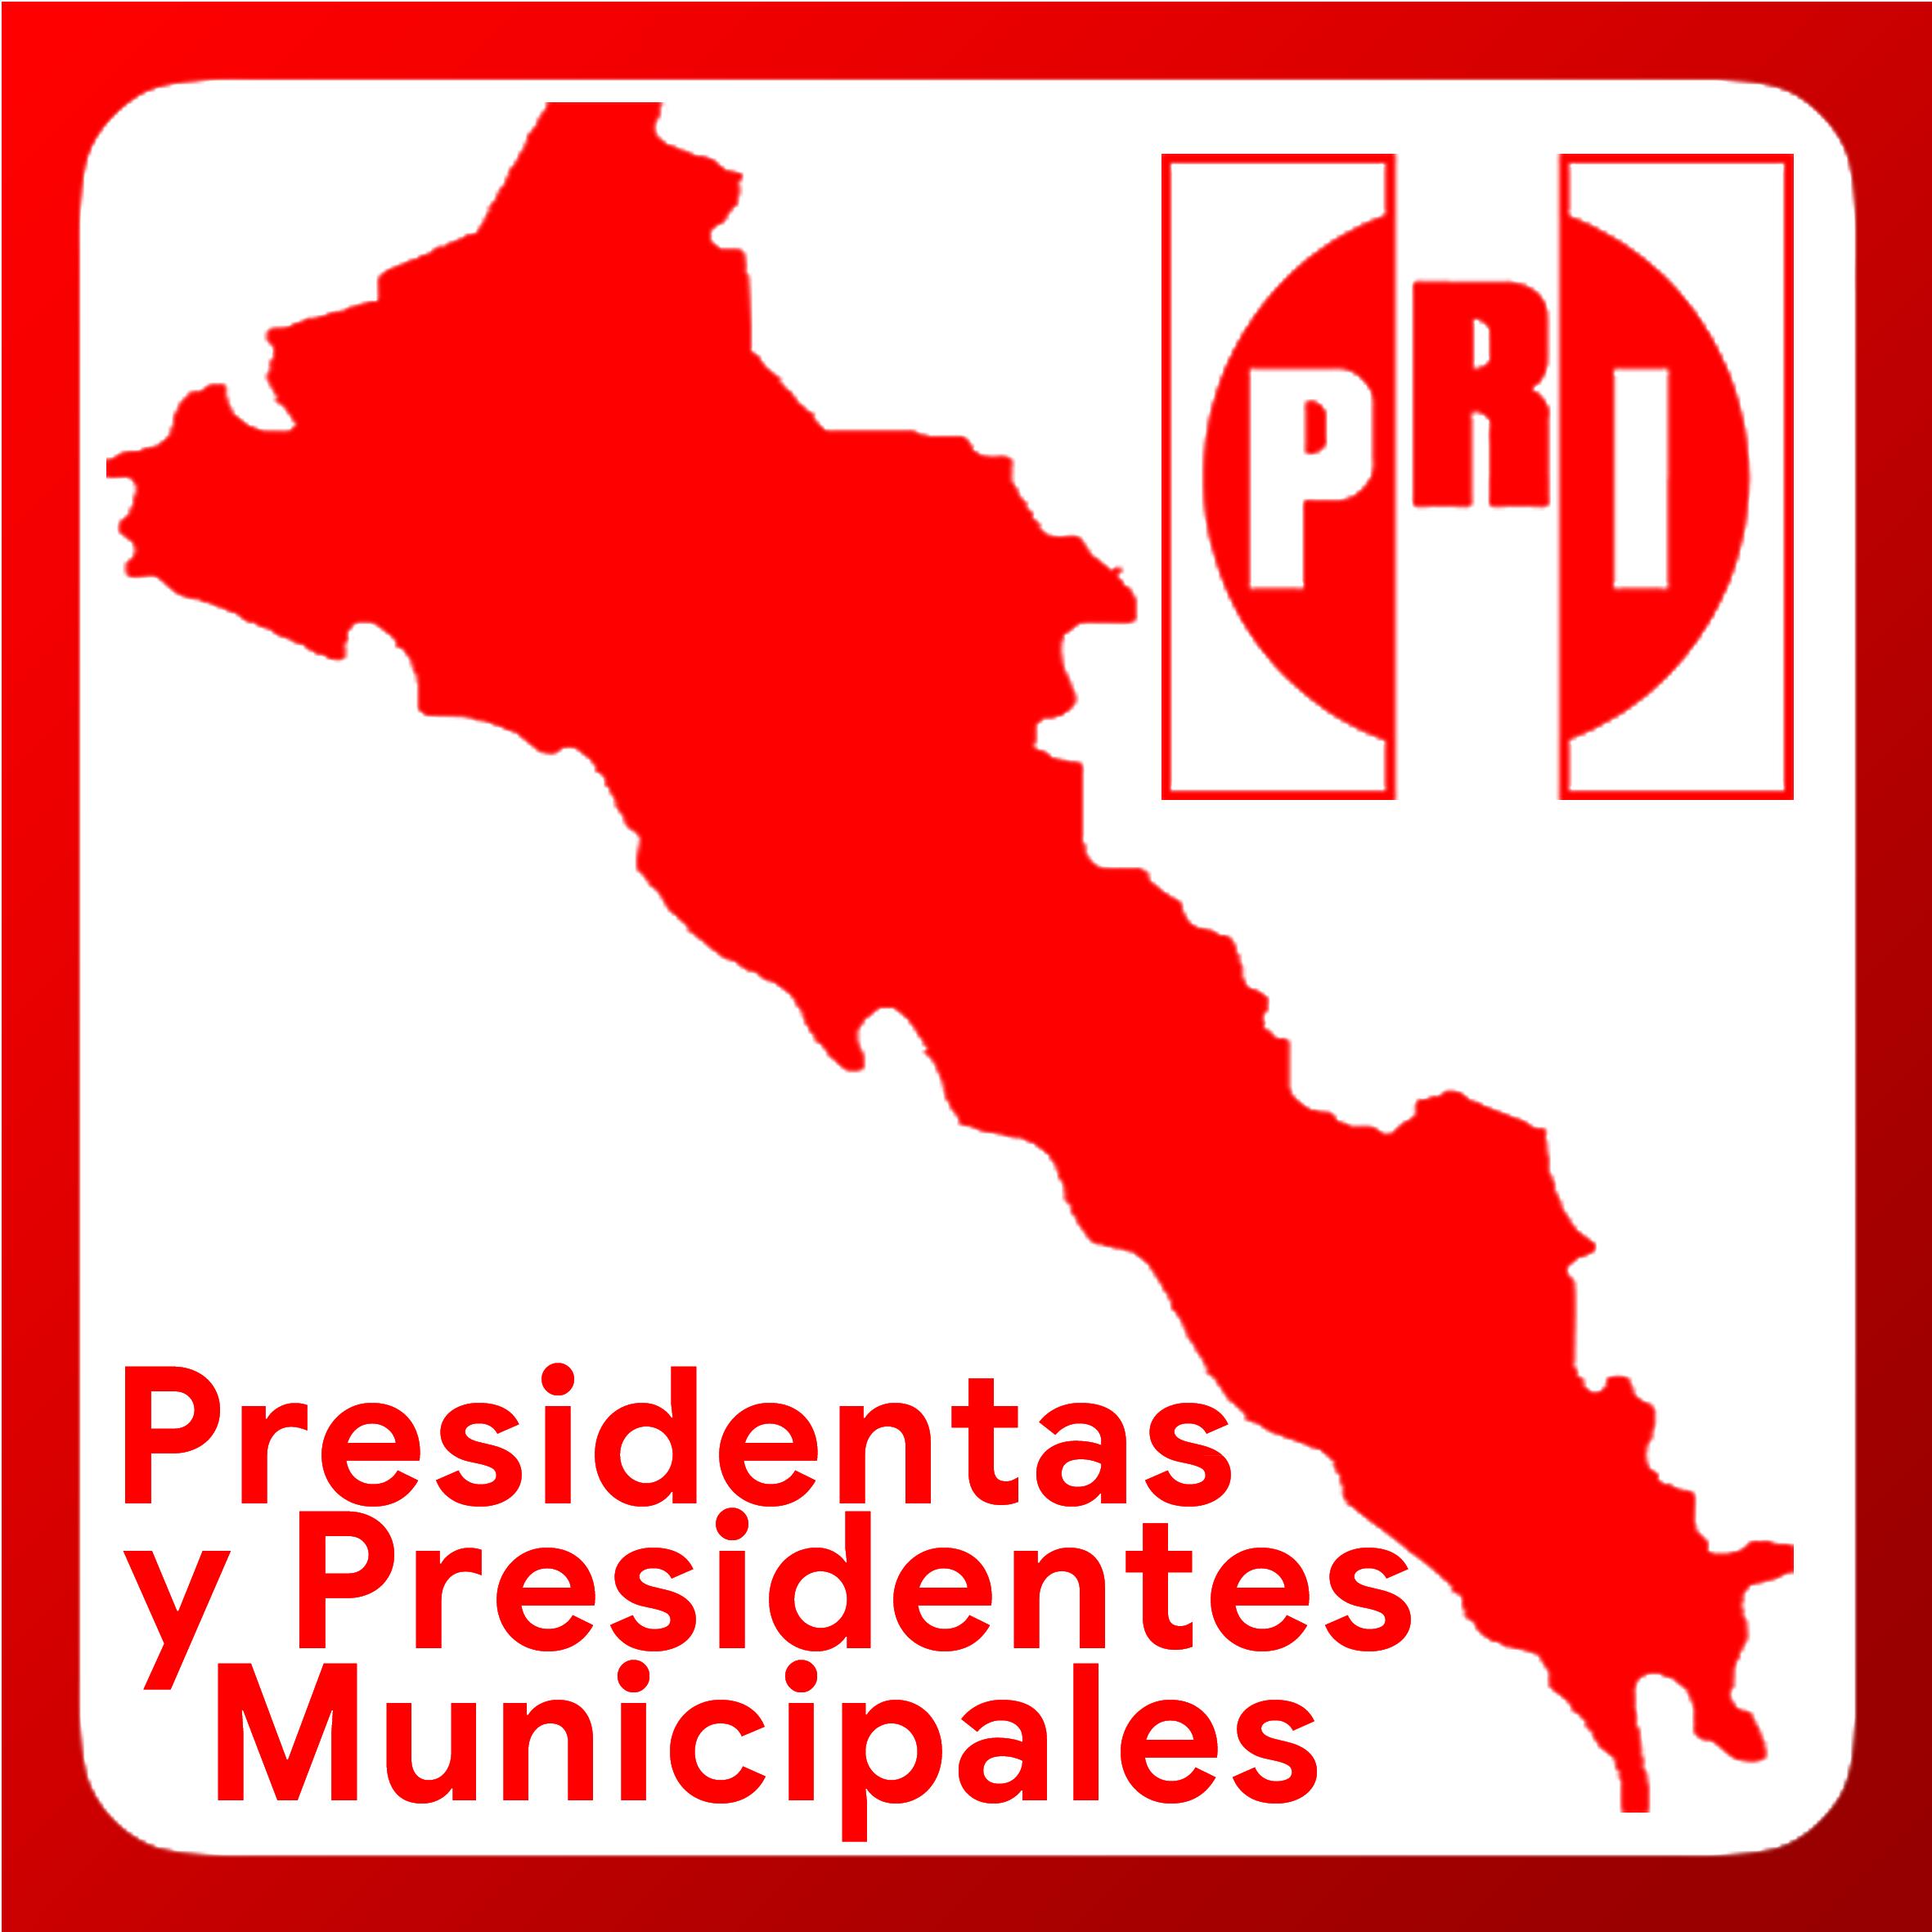 Boton activable de Presidentas y Presidentes Municipales